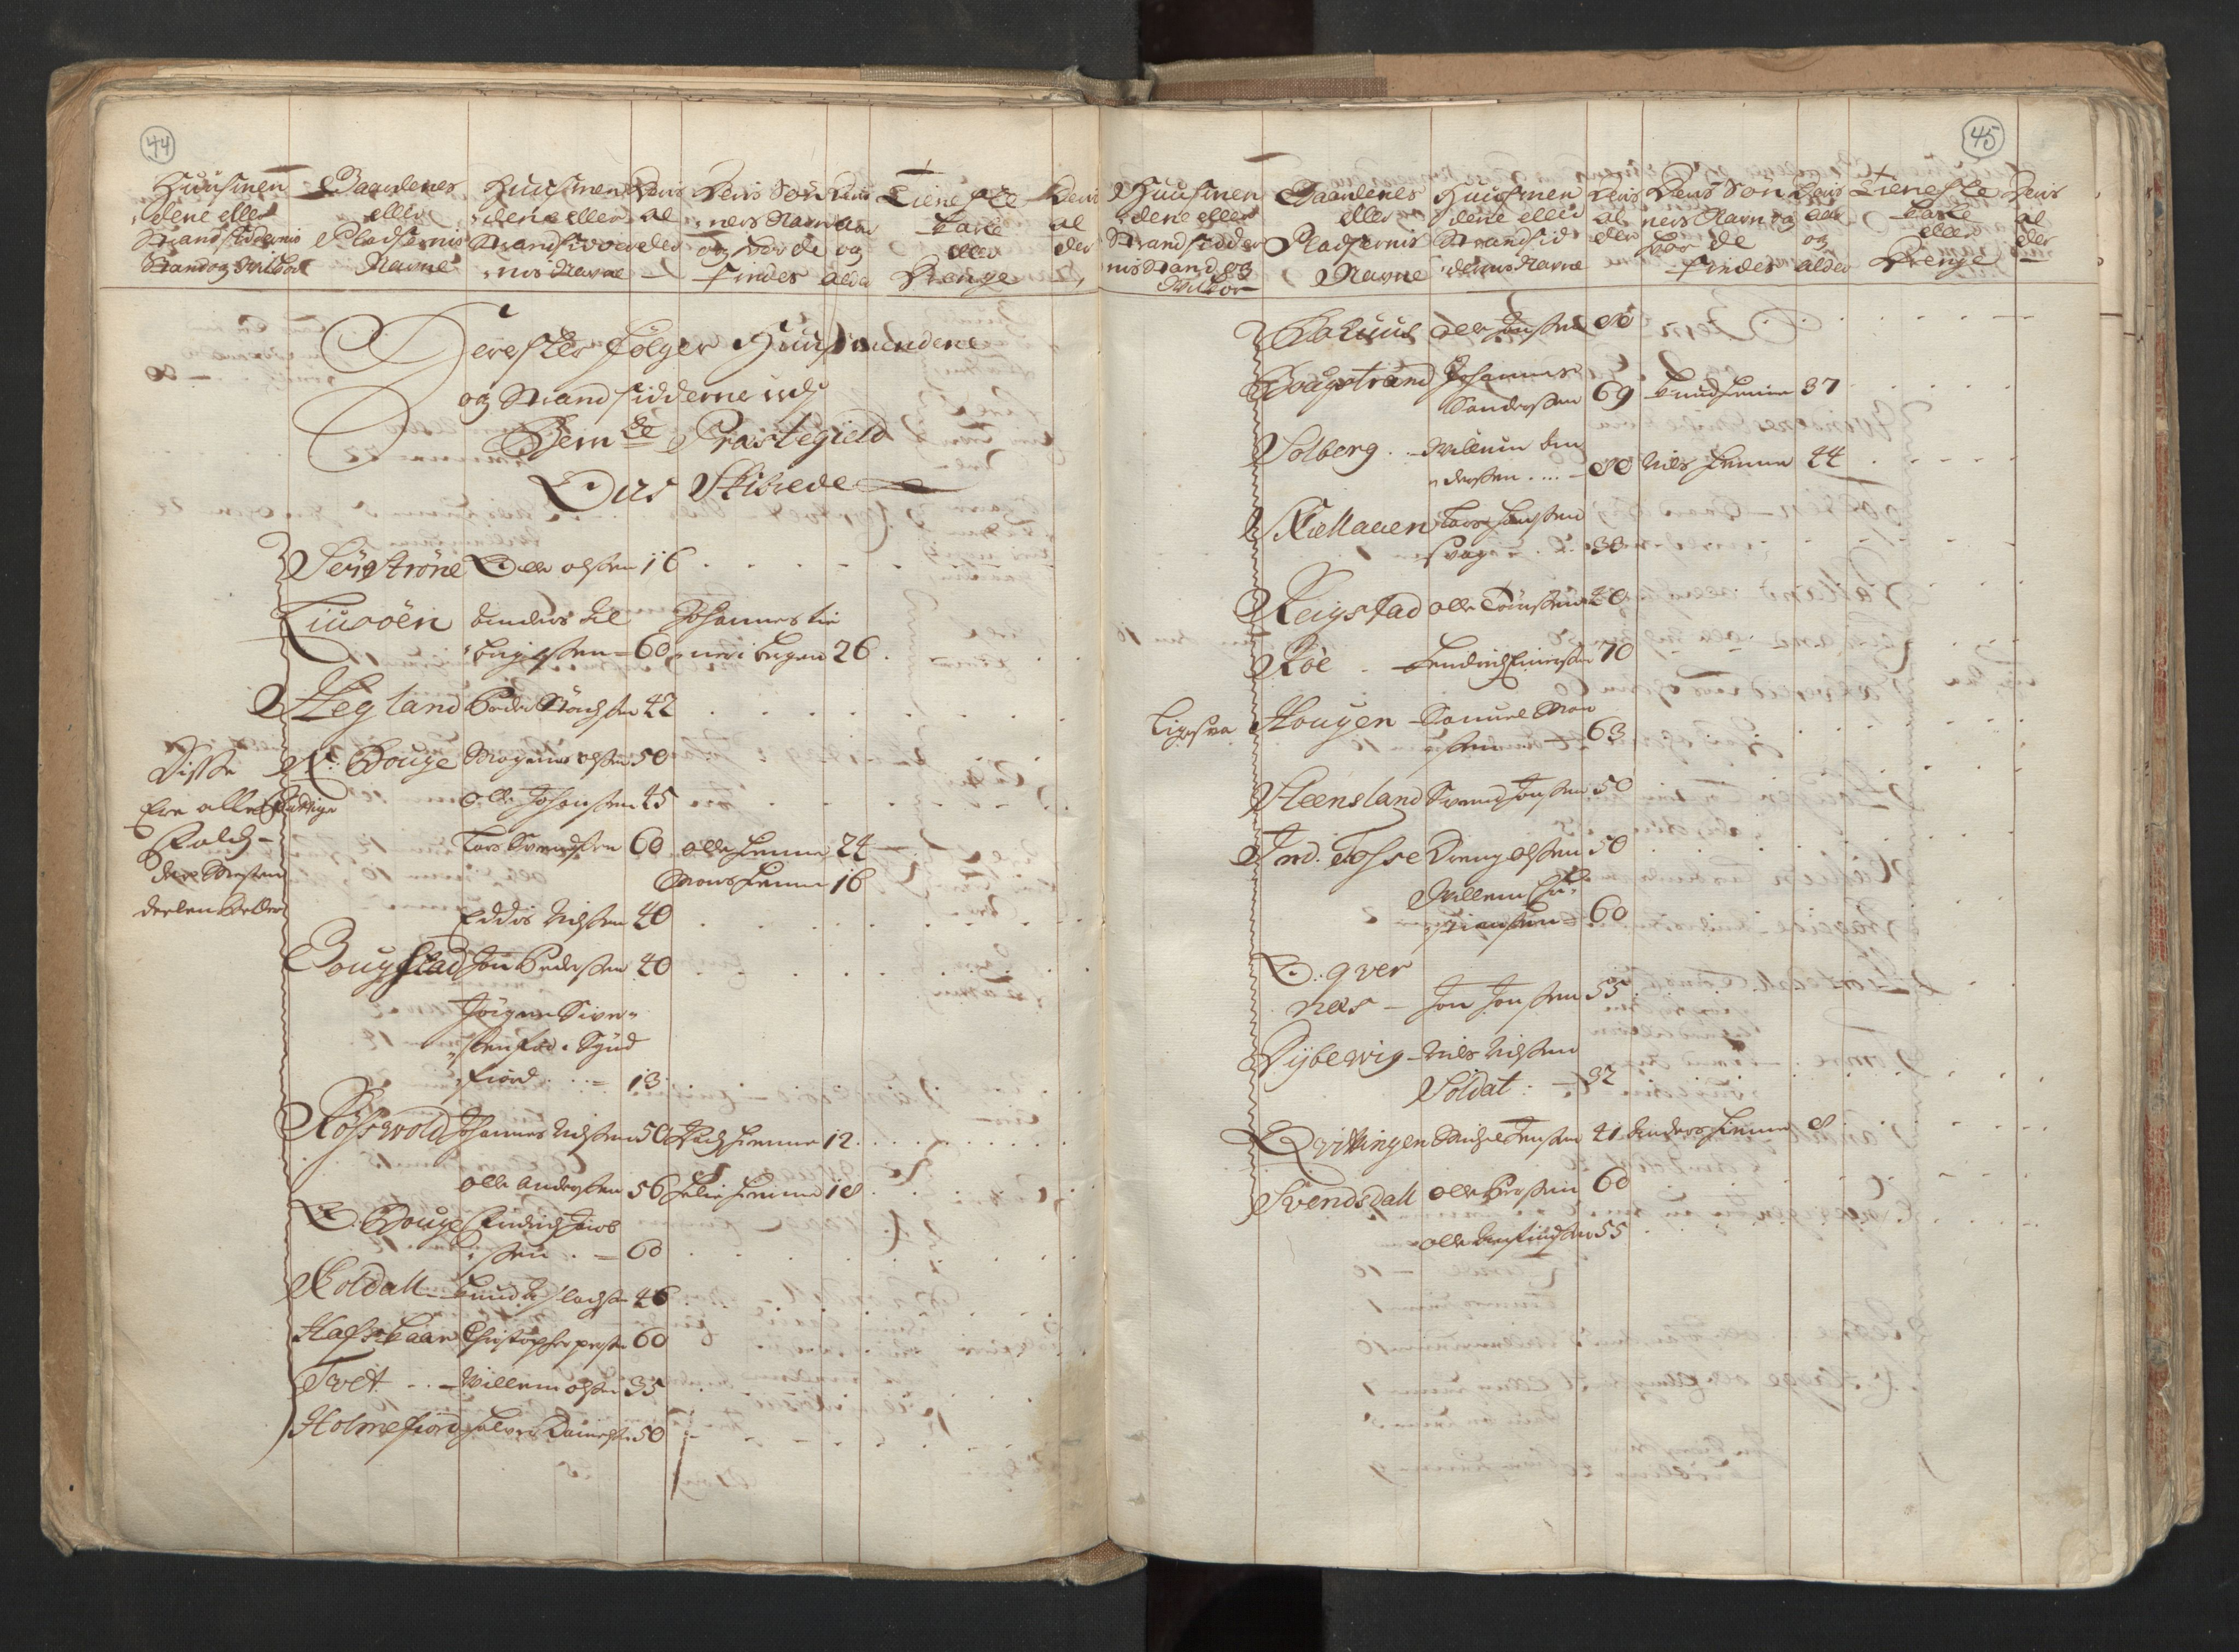 RA, Manntallet 1701, nr. 6: Sunnhordland fogderi og Hardanger fogderi, 1701, s. 44-45